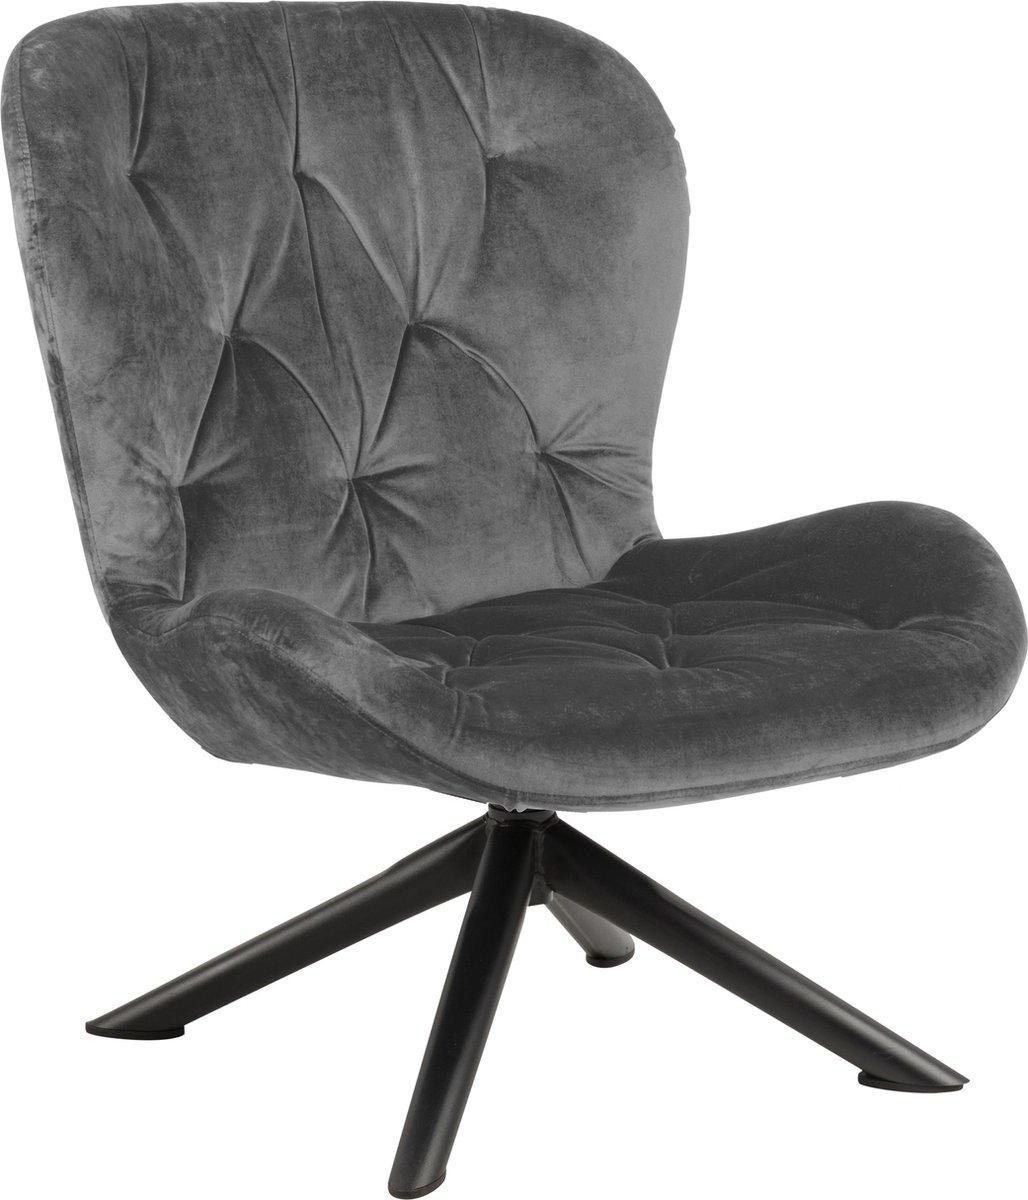 Bali fauteuil grijs.